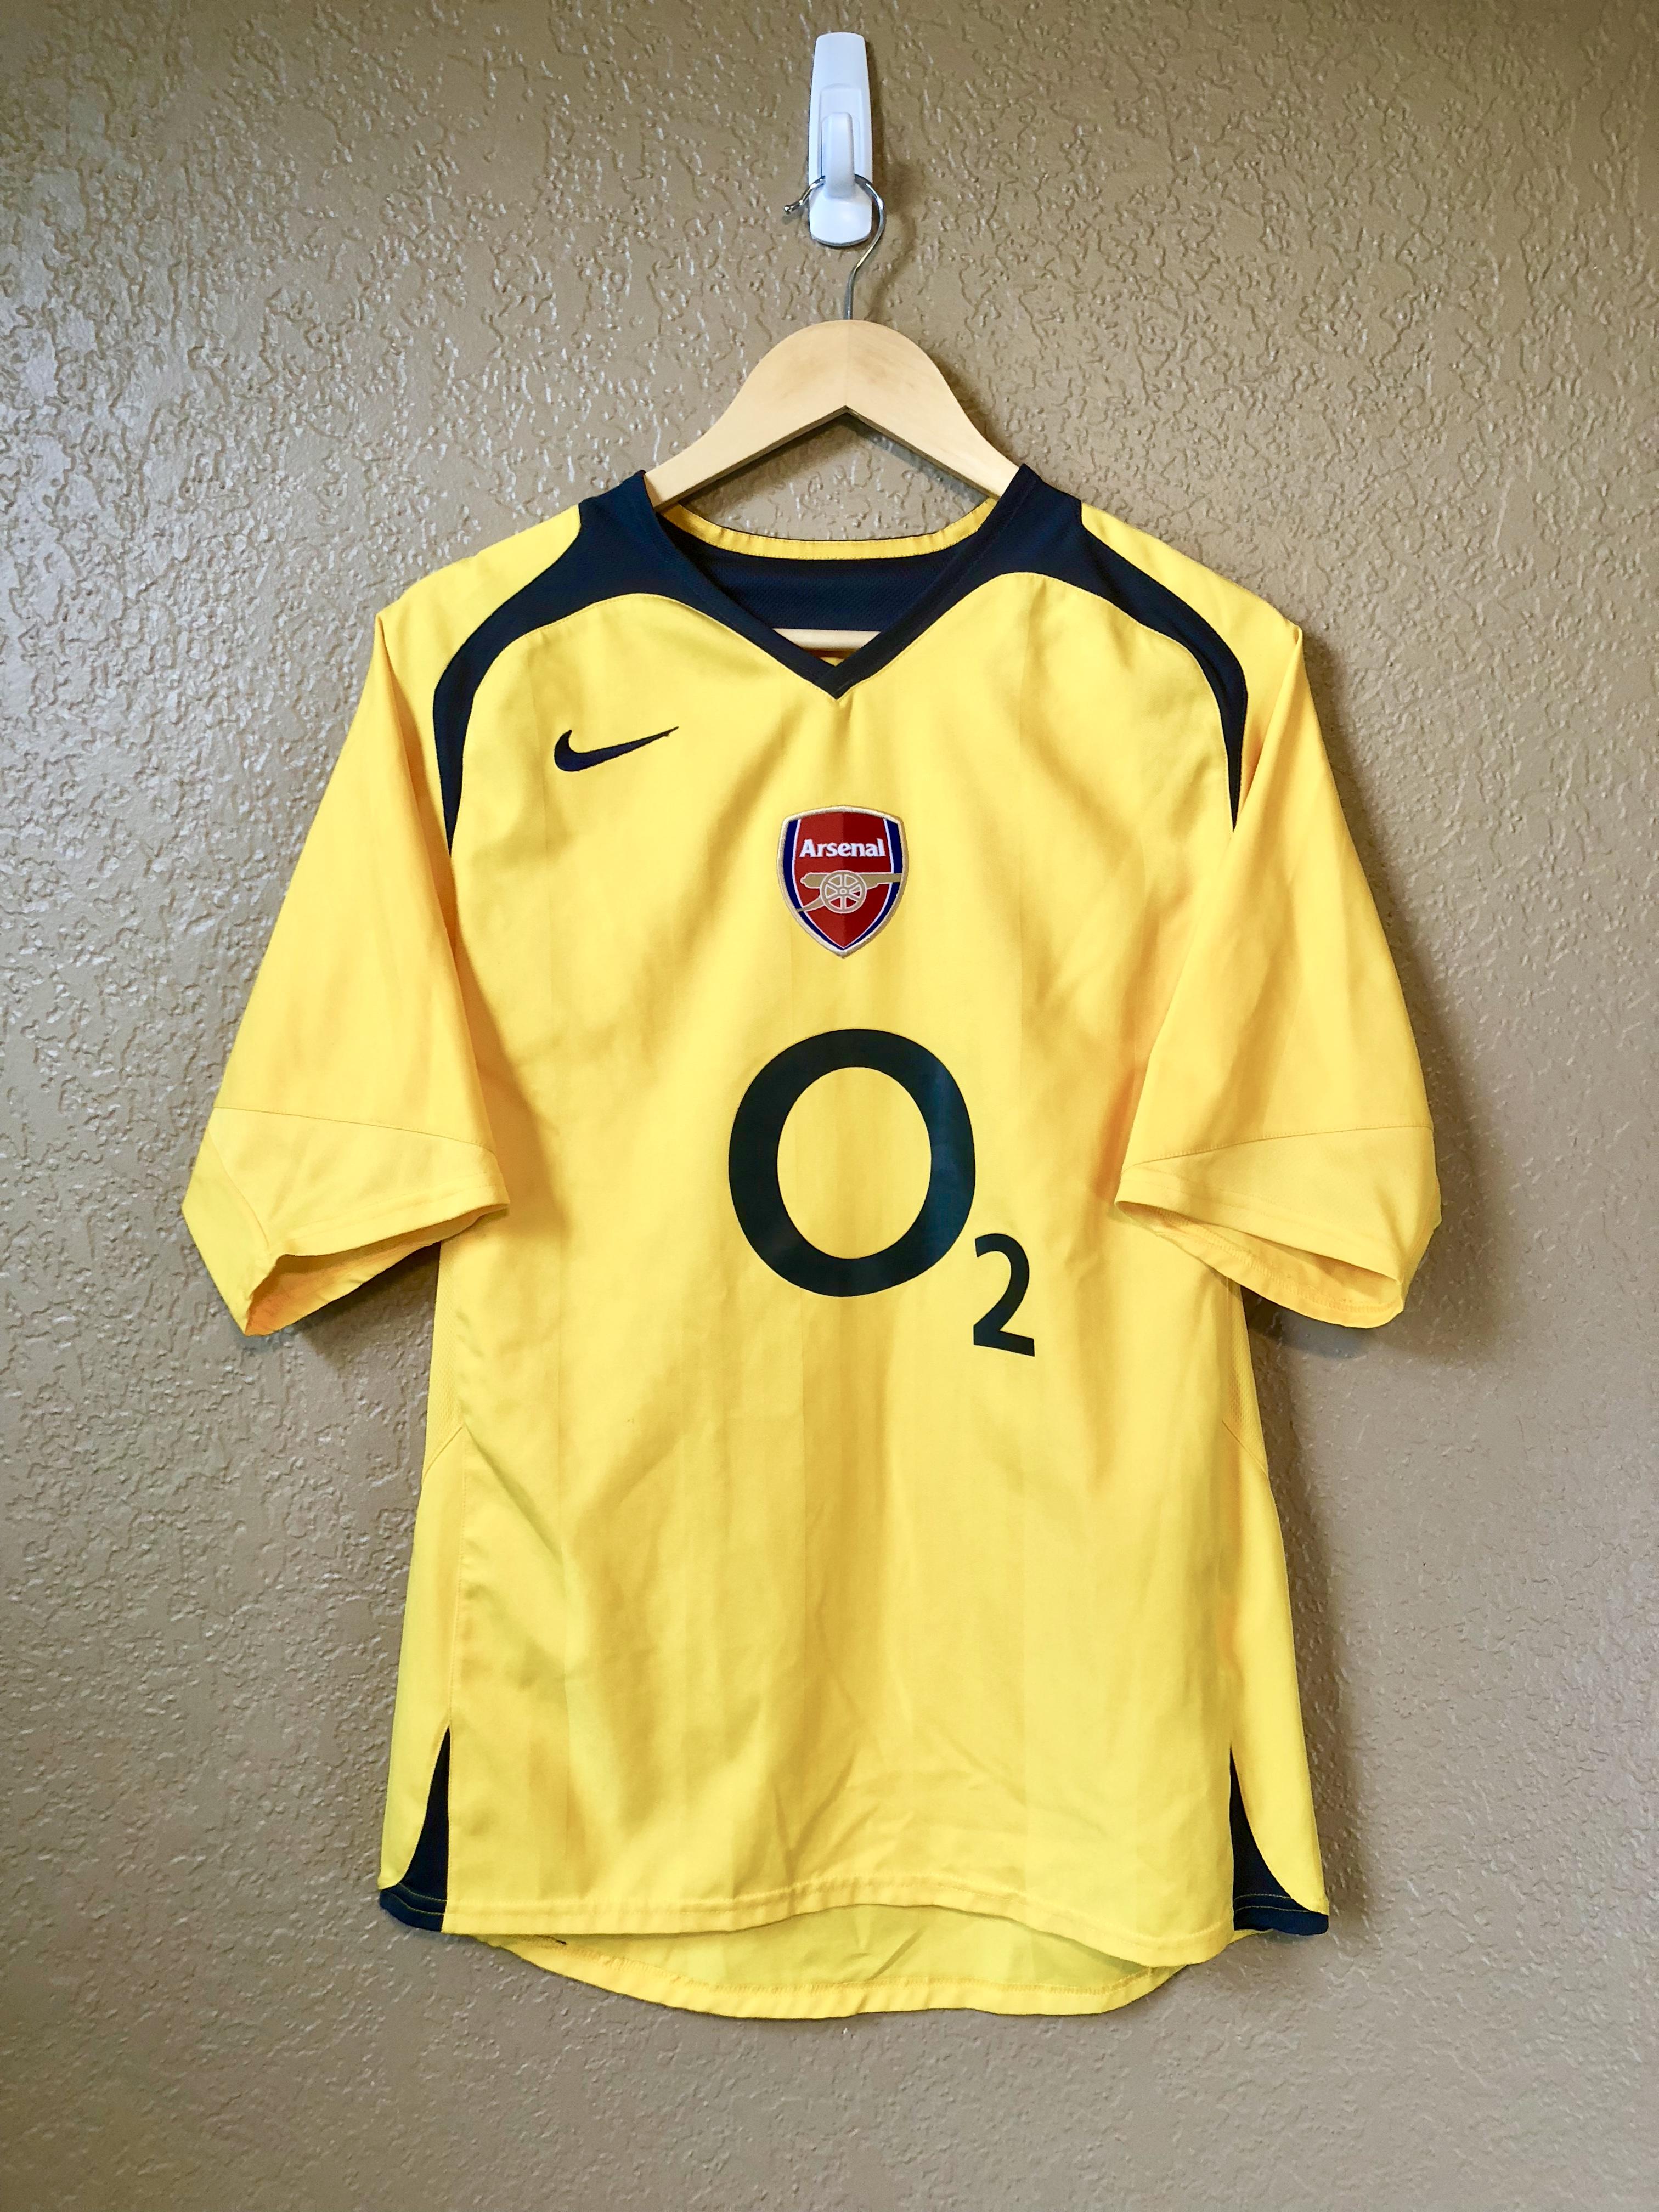 super popular 22349 92e97 2005 - 2006 London Arsenal FC Yellow Away Jersey Kit